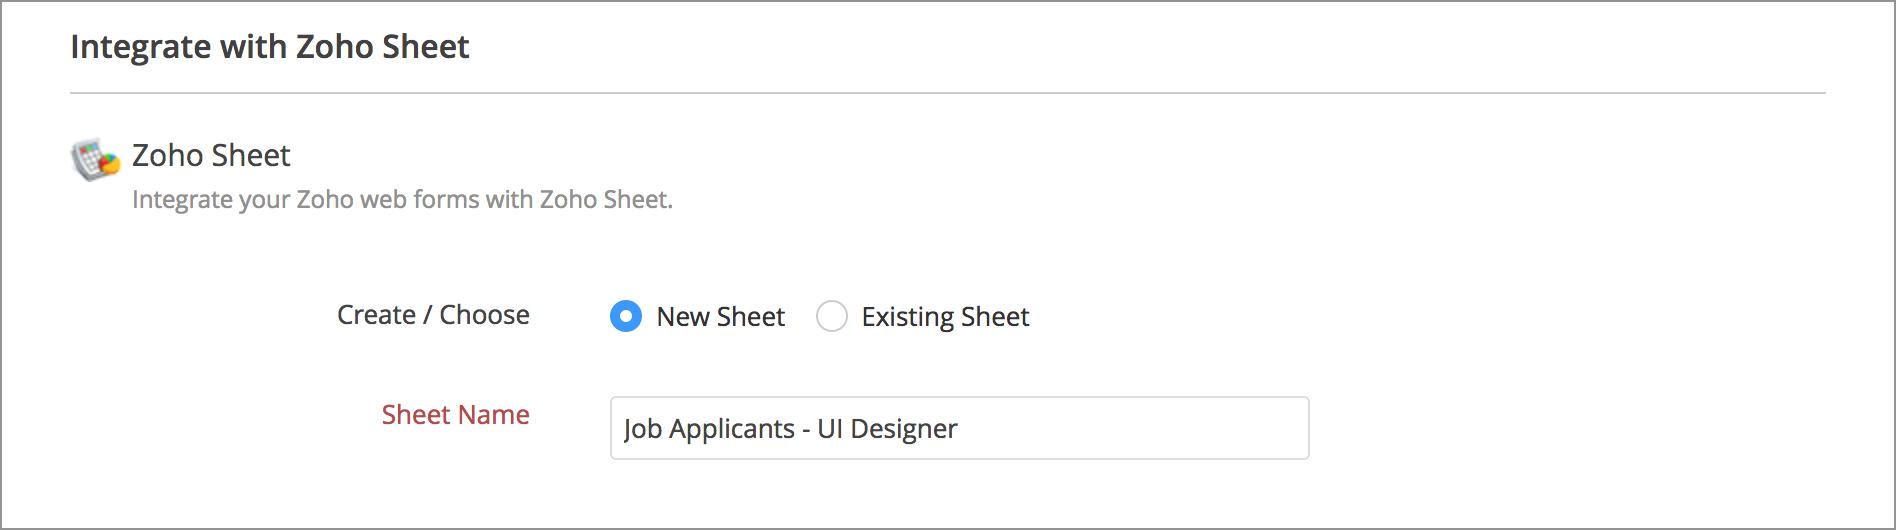 Zoho Spreadsheet Login Within Zoho Sheet Integration  Zoho Forms  User Guide